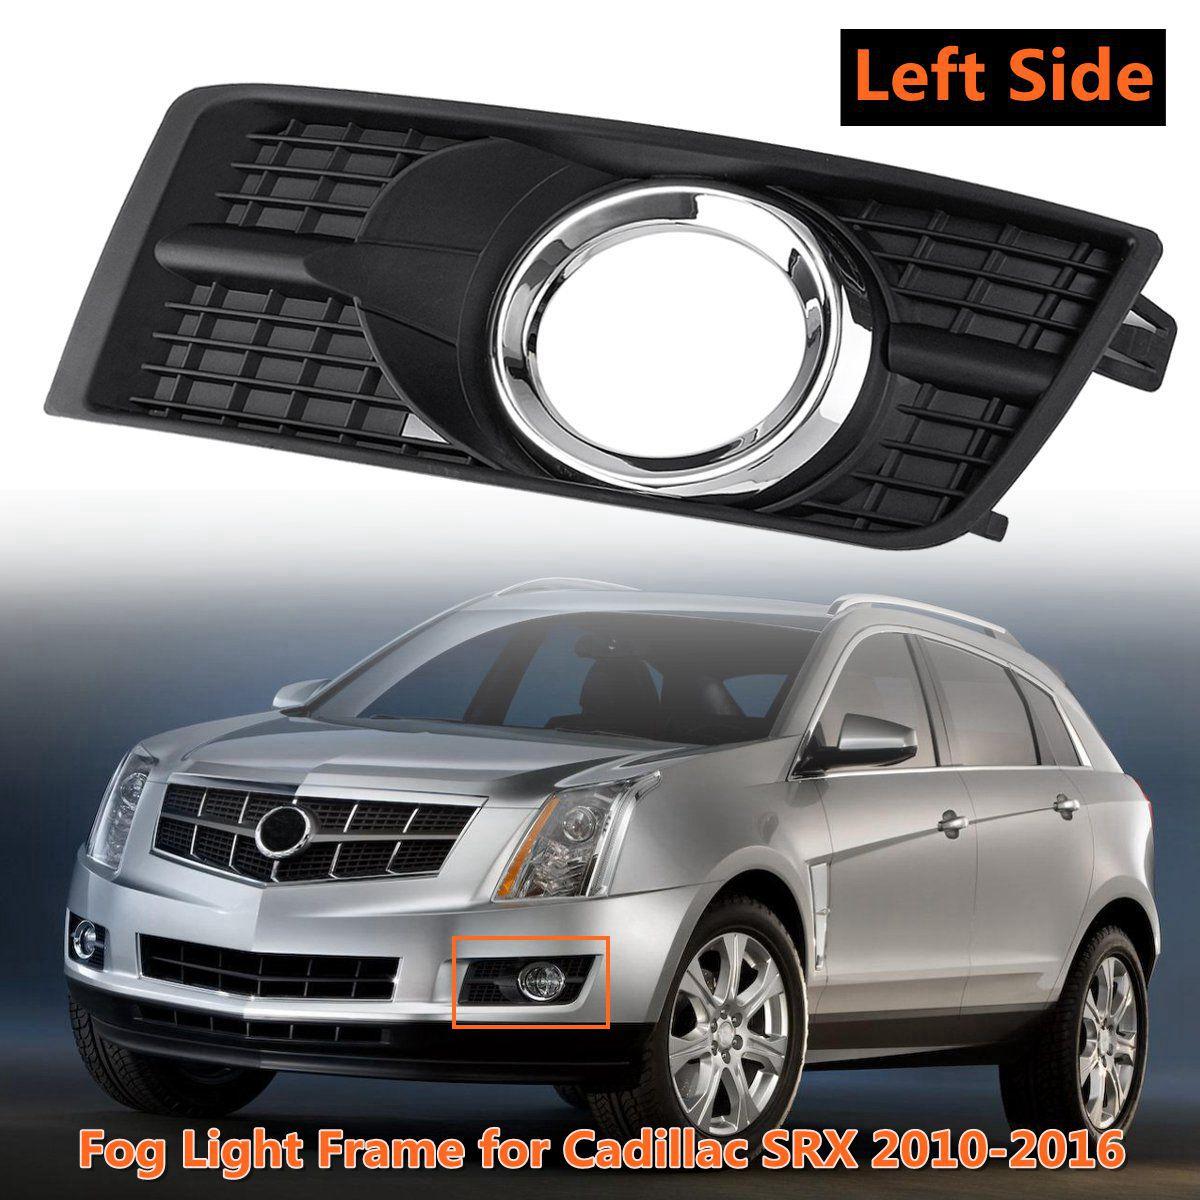 front bumper fog light frame grilling cover foglamp trim shell cap garnish hood for cadillac srx [ 1200 x 1200 Pixel ]